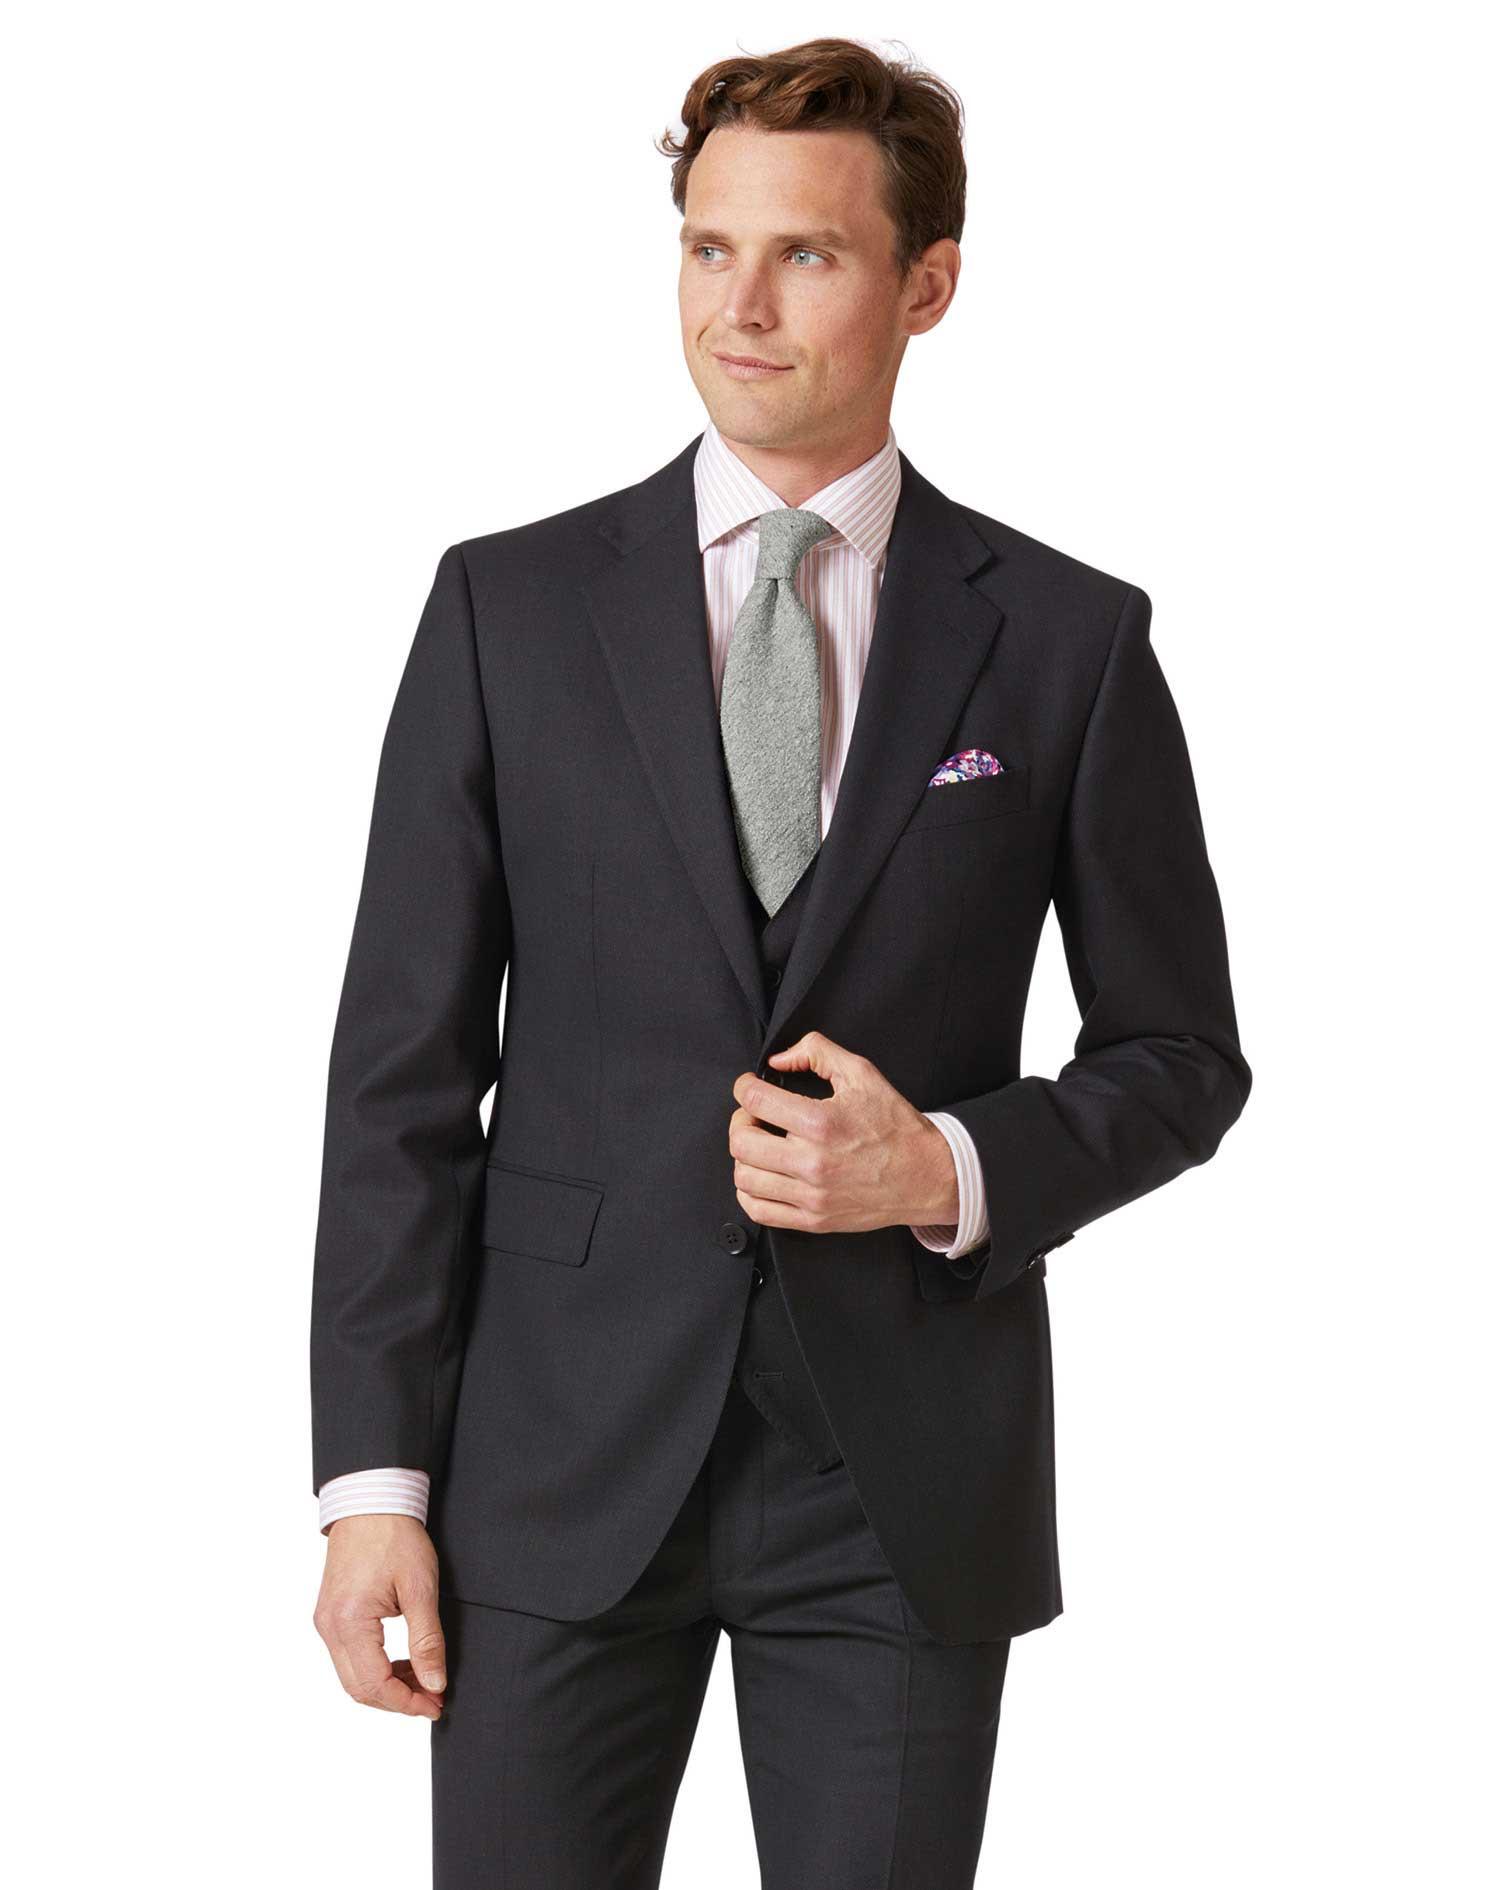 Charcoal Slim Fit Birdseye Travel Suit Wool Jacket Size 42 Regular by Charles Tyrwhitt